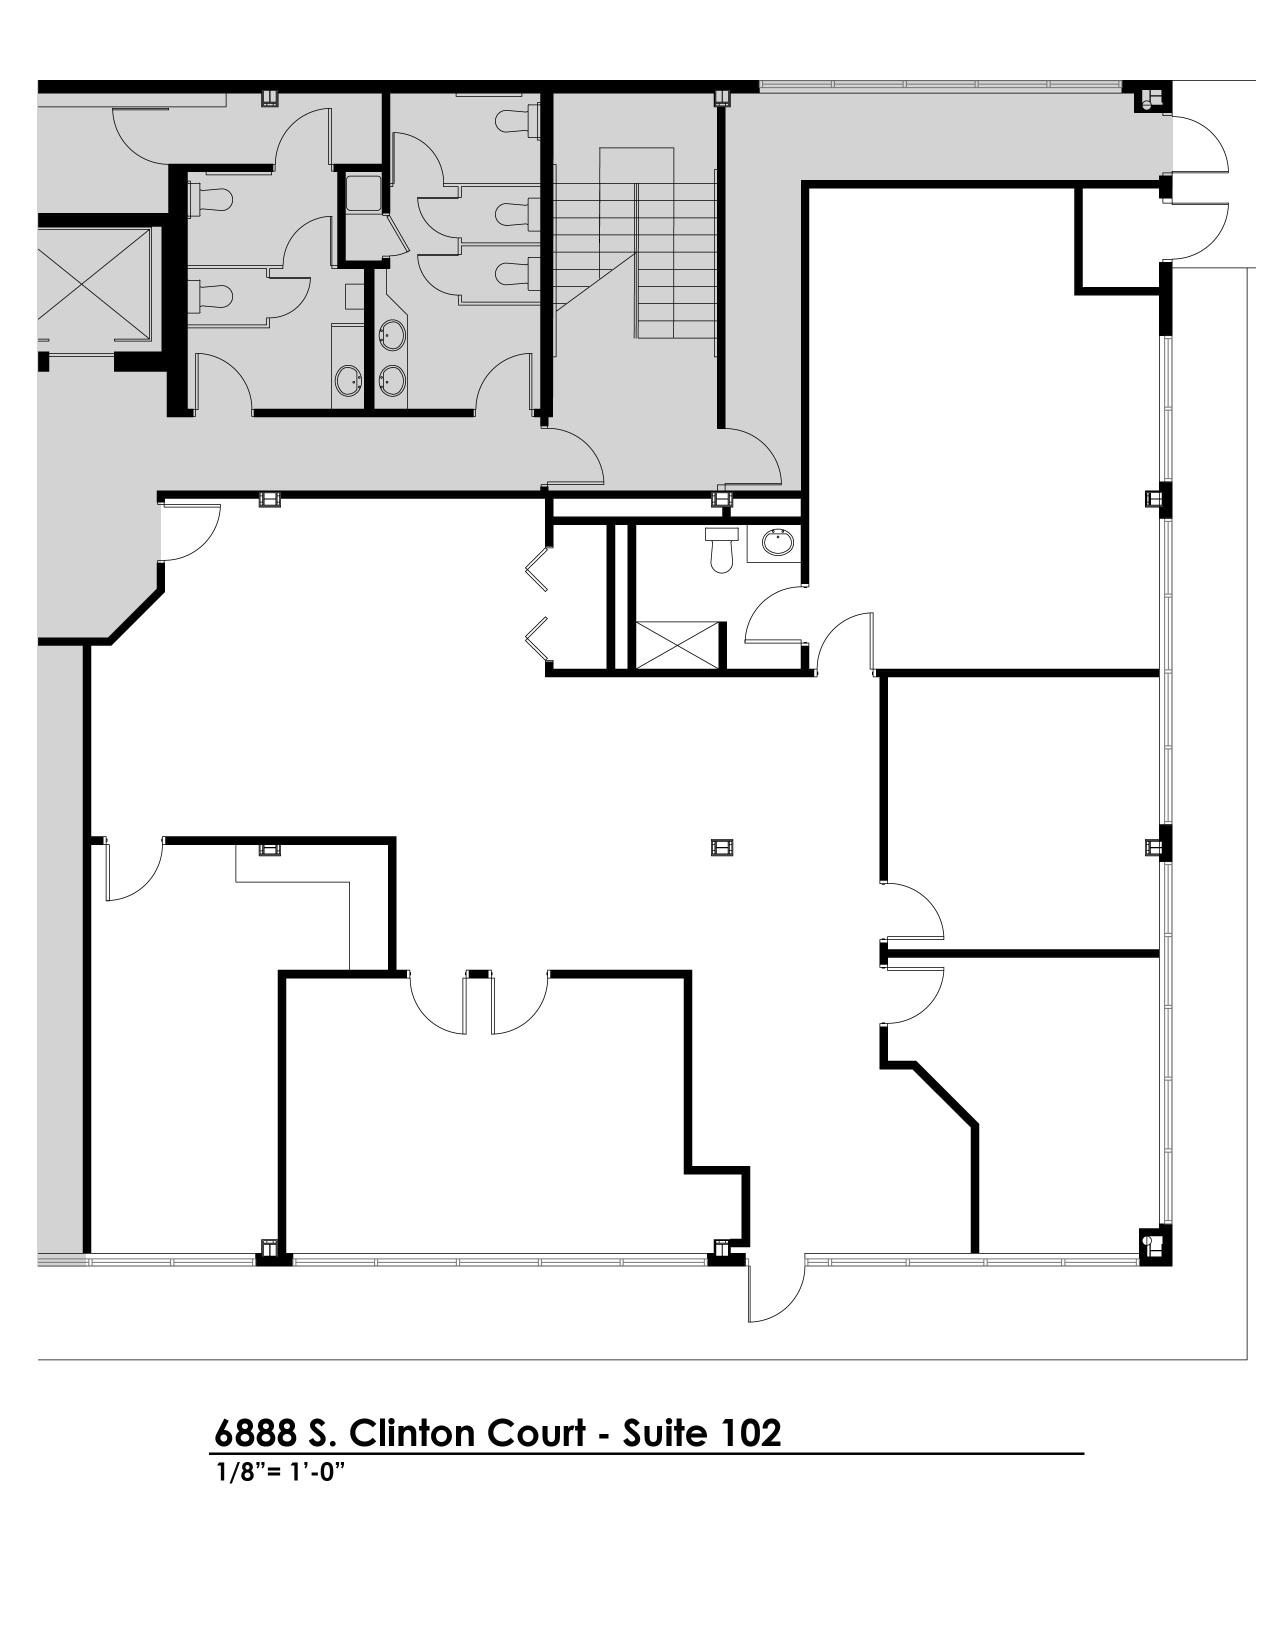 Suite 102 - Floorplan